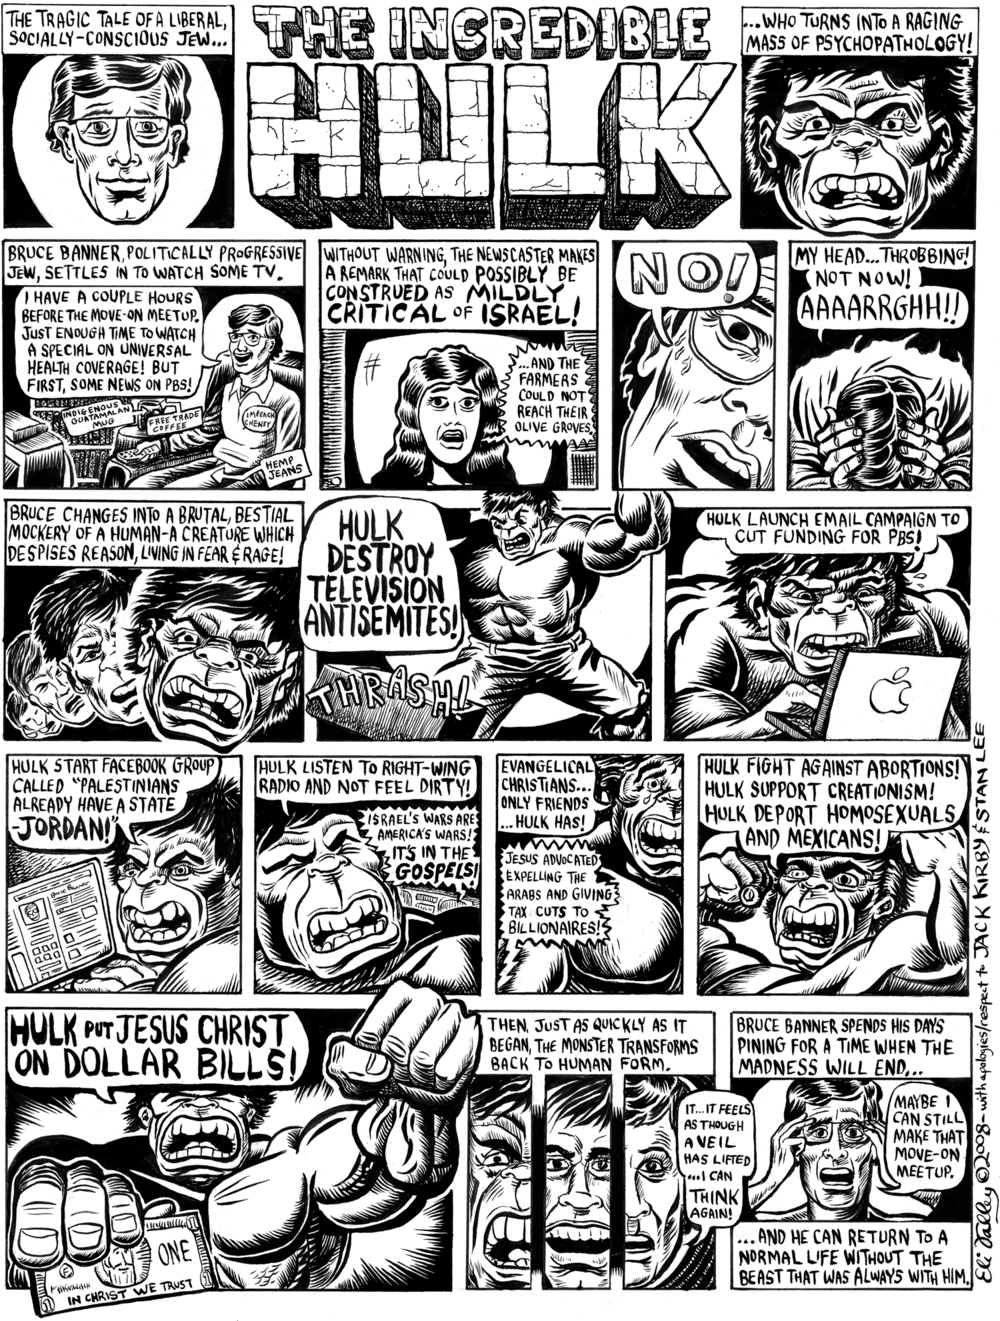 The Incredible Hulk. Jewcy, 6/12/08